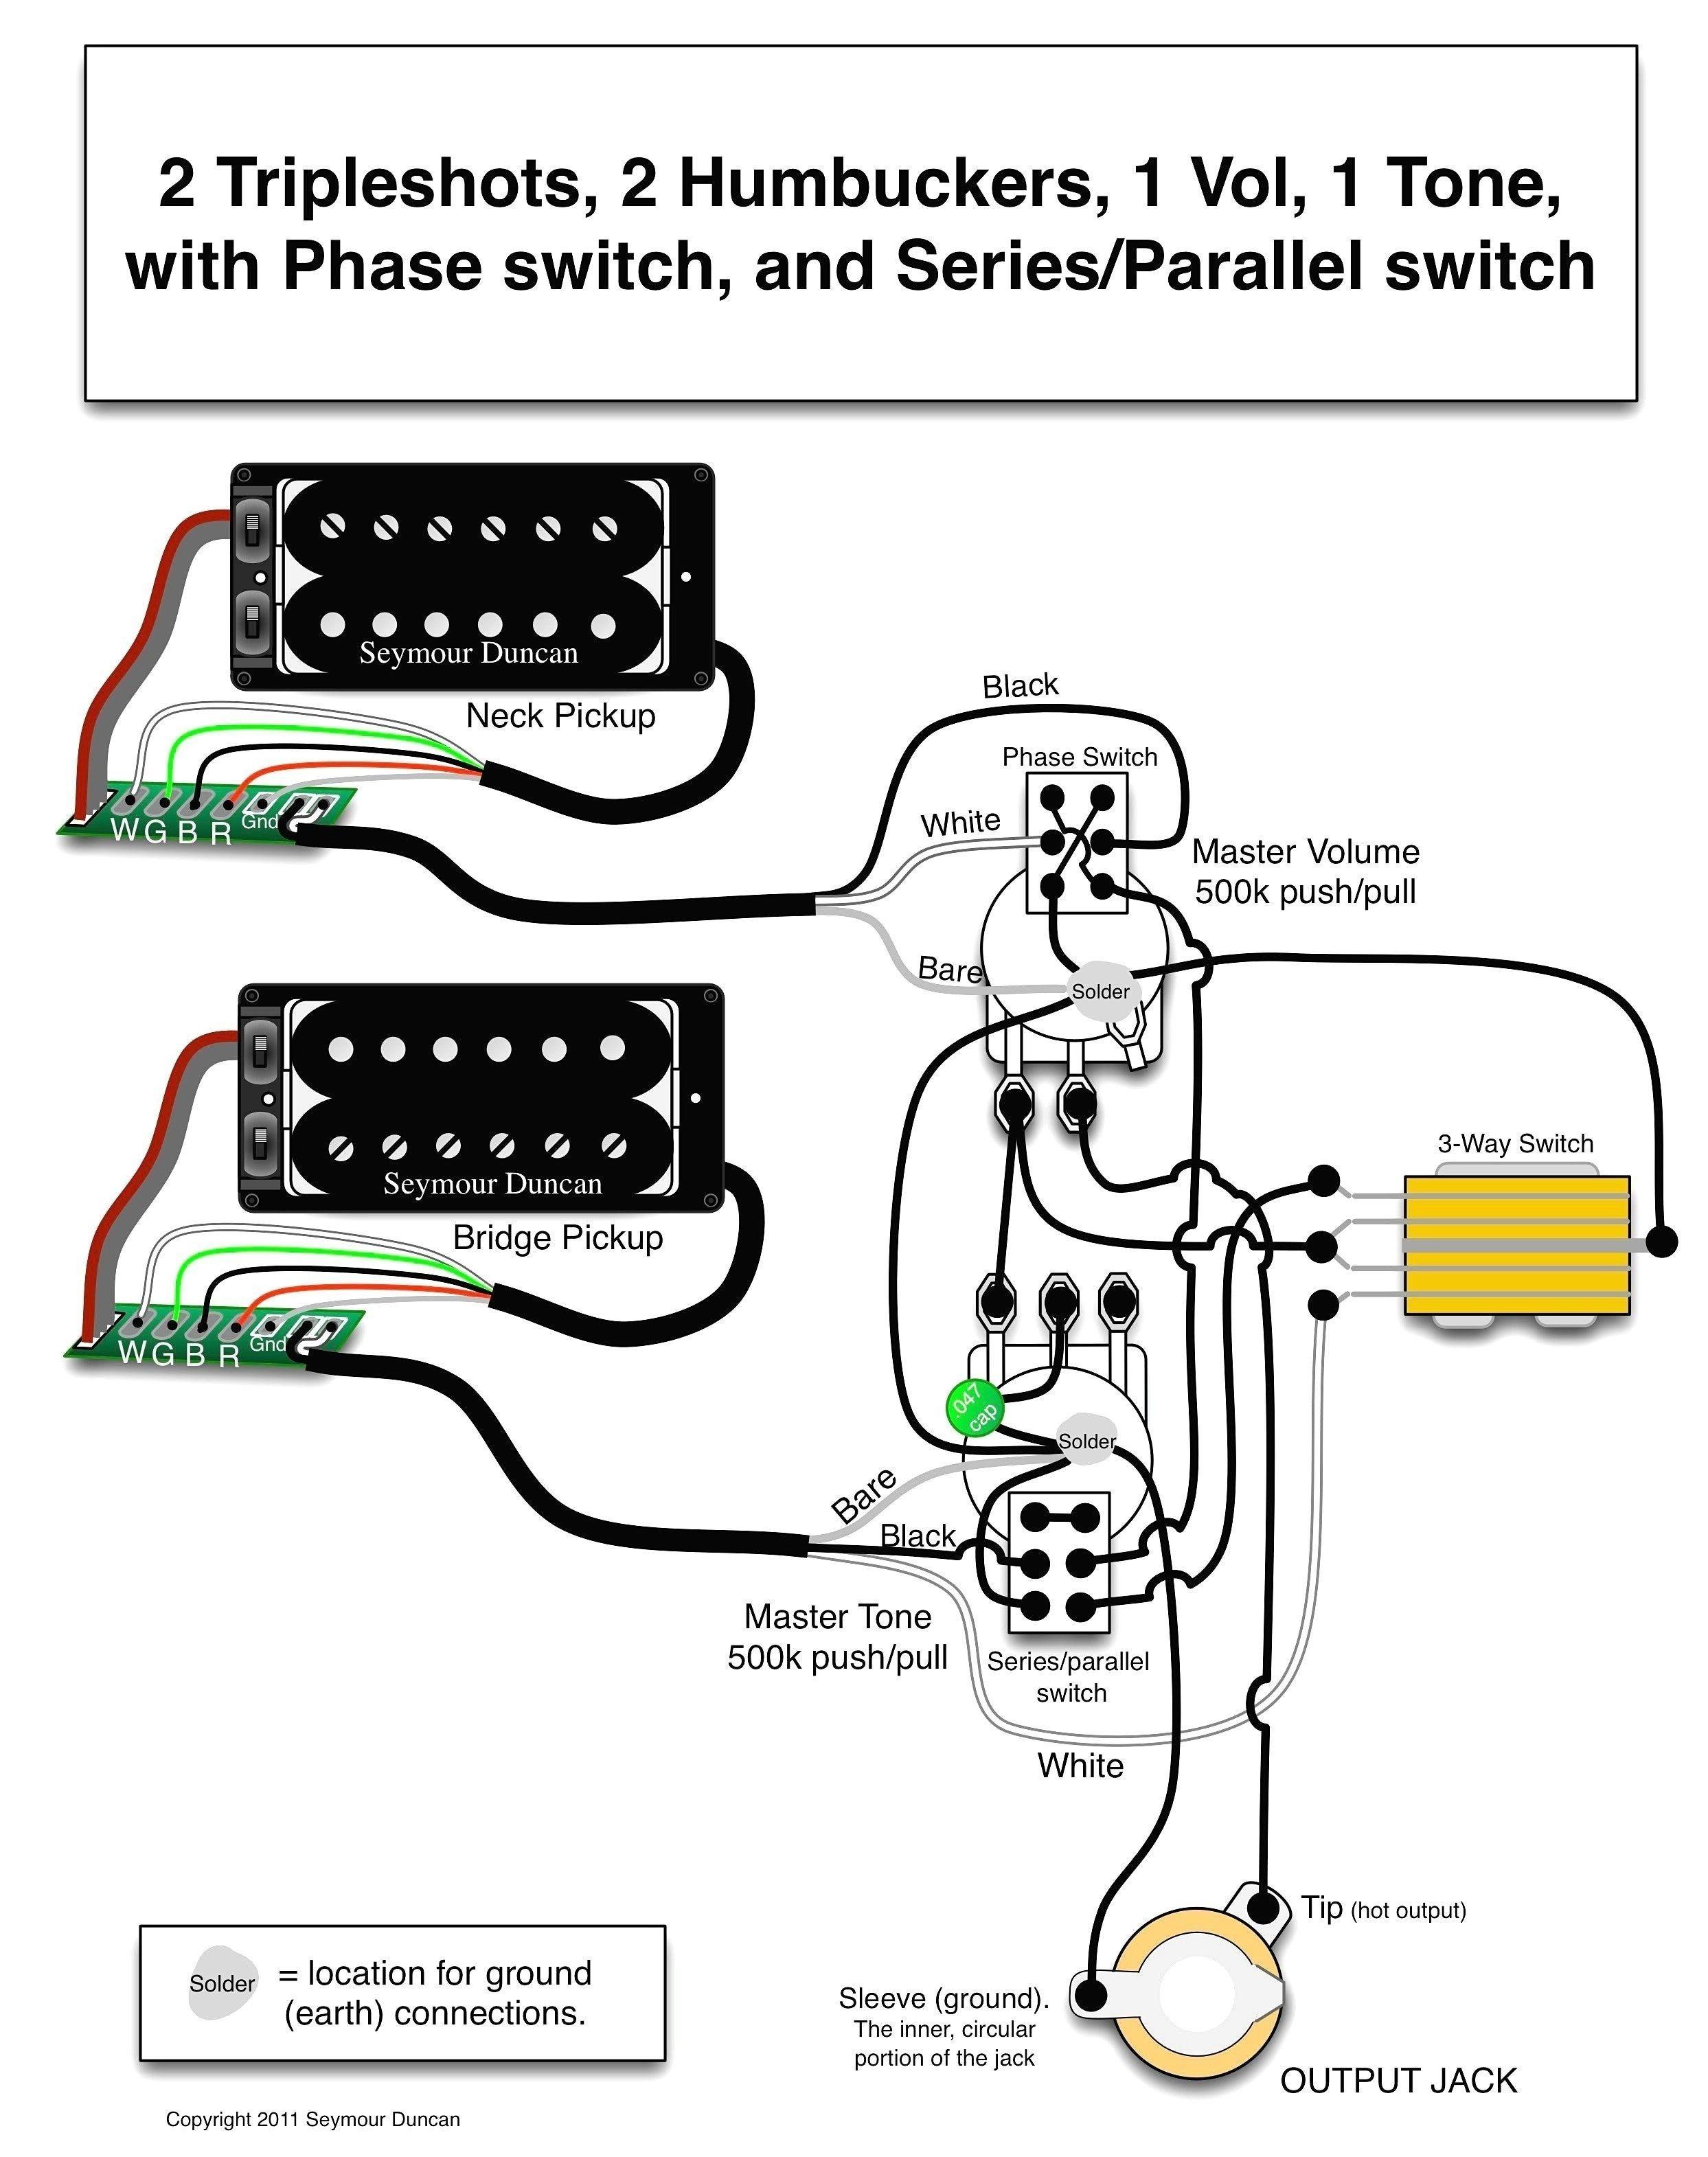 small resolution of new epiphone les paul coil tap wiring diagram diagram diagramsample diagramtemplate wiringdiagram diagramchart worksheet worksheettemplate